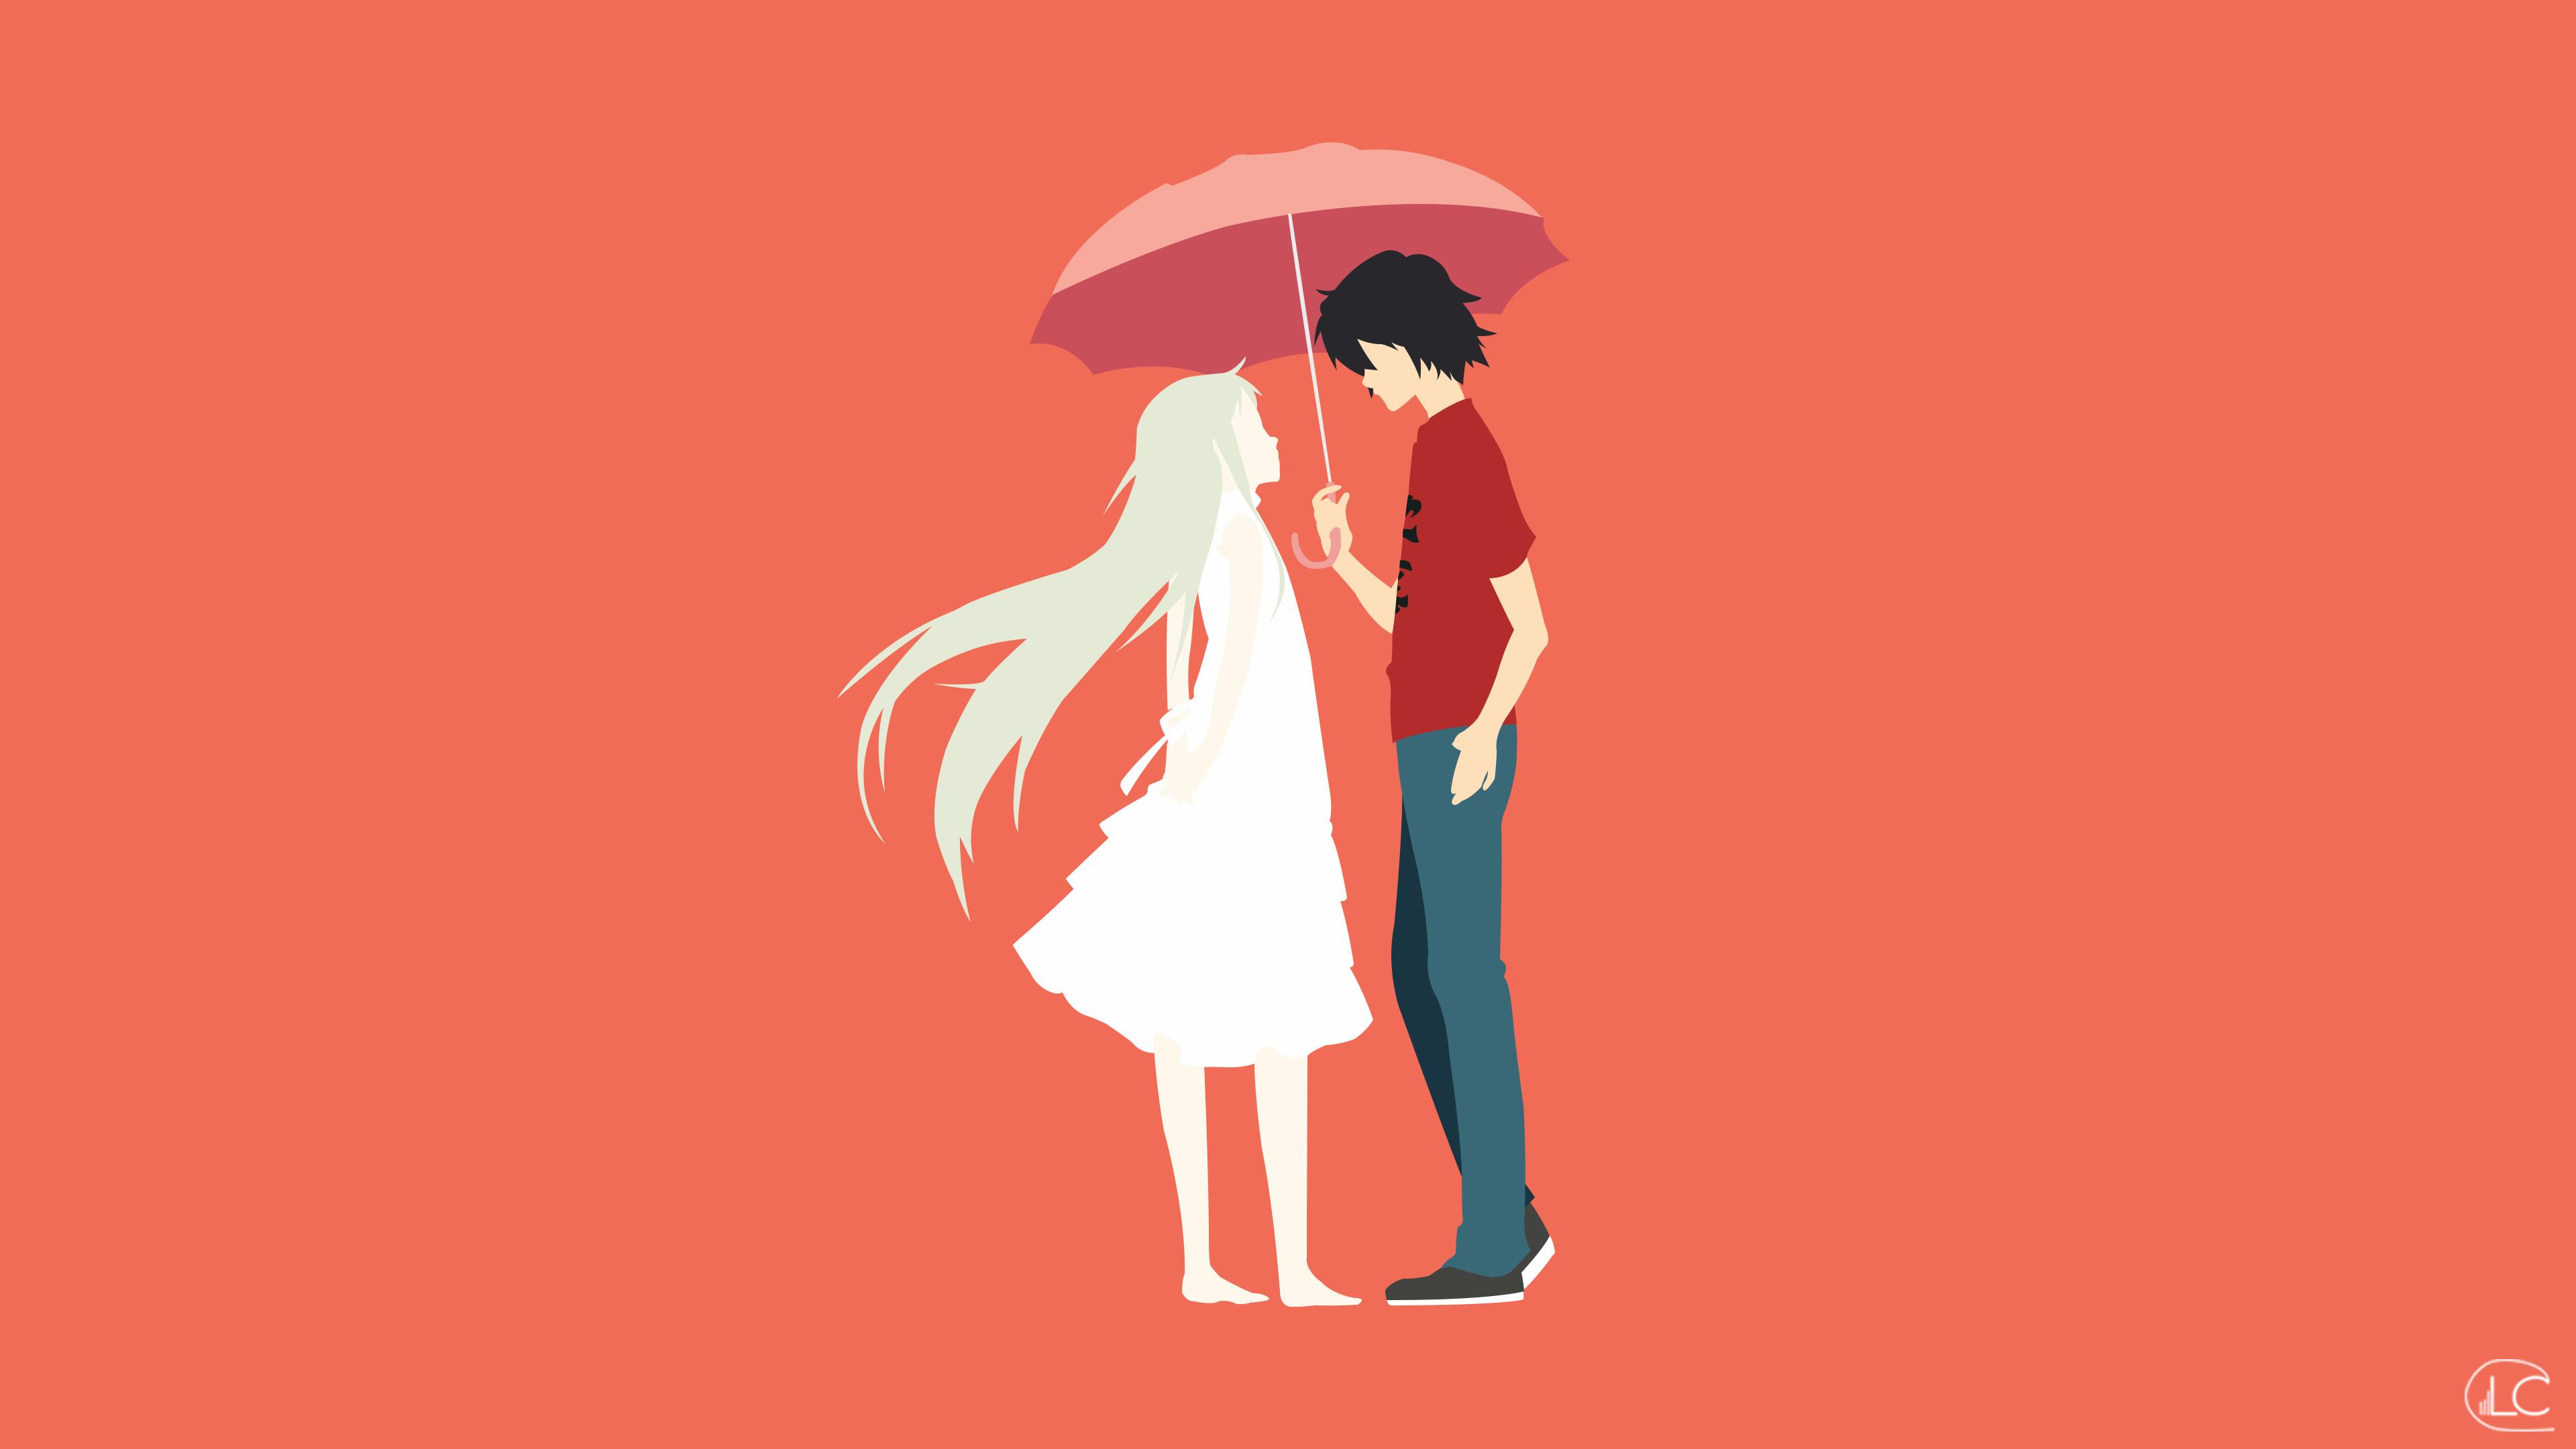 … Menma x Jintan | Anohana Minimalist Anime by Lucifer012